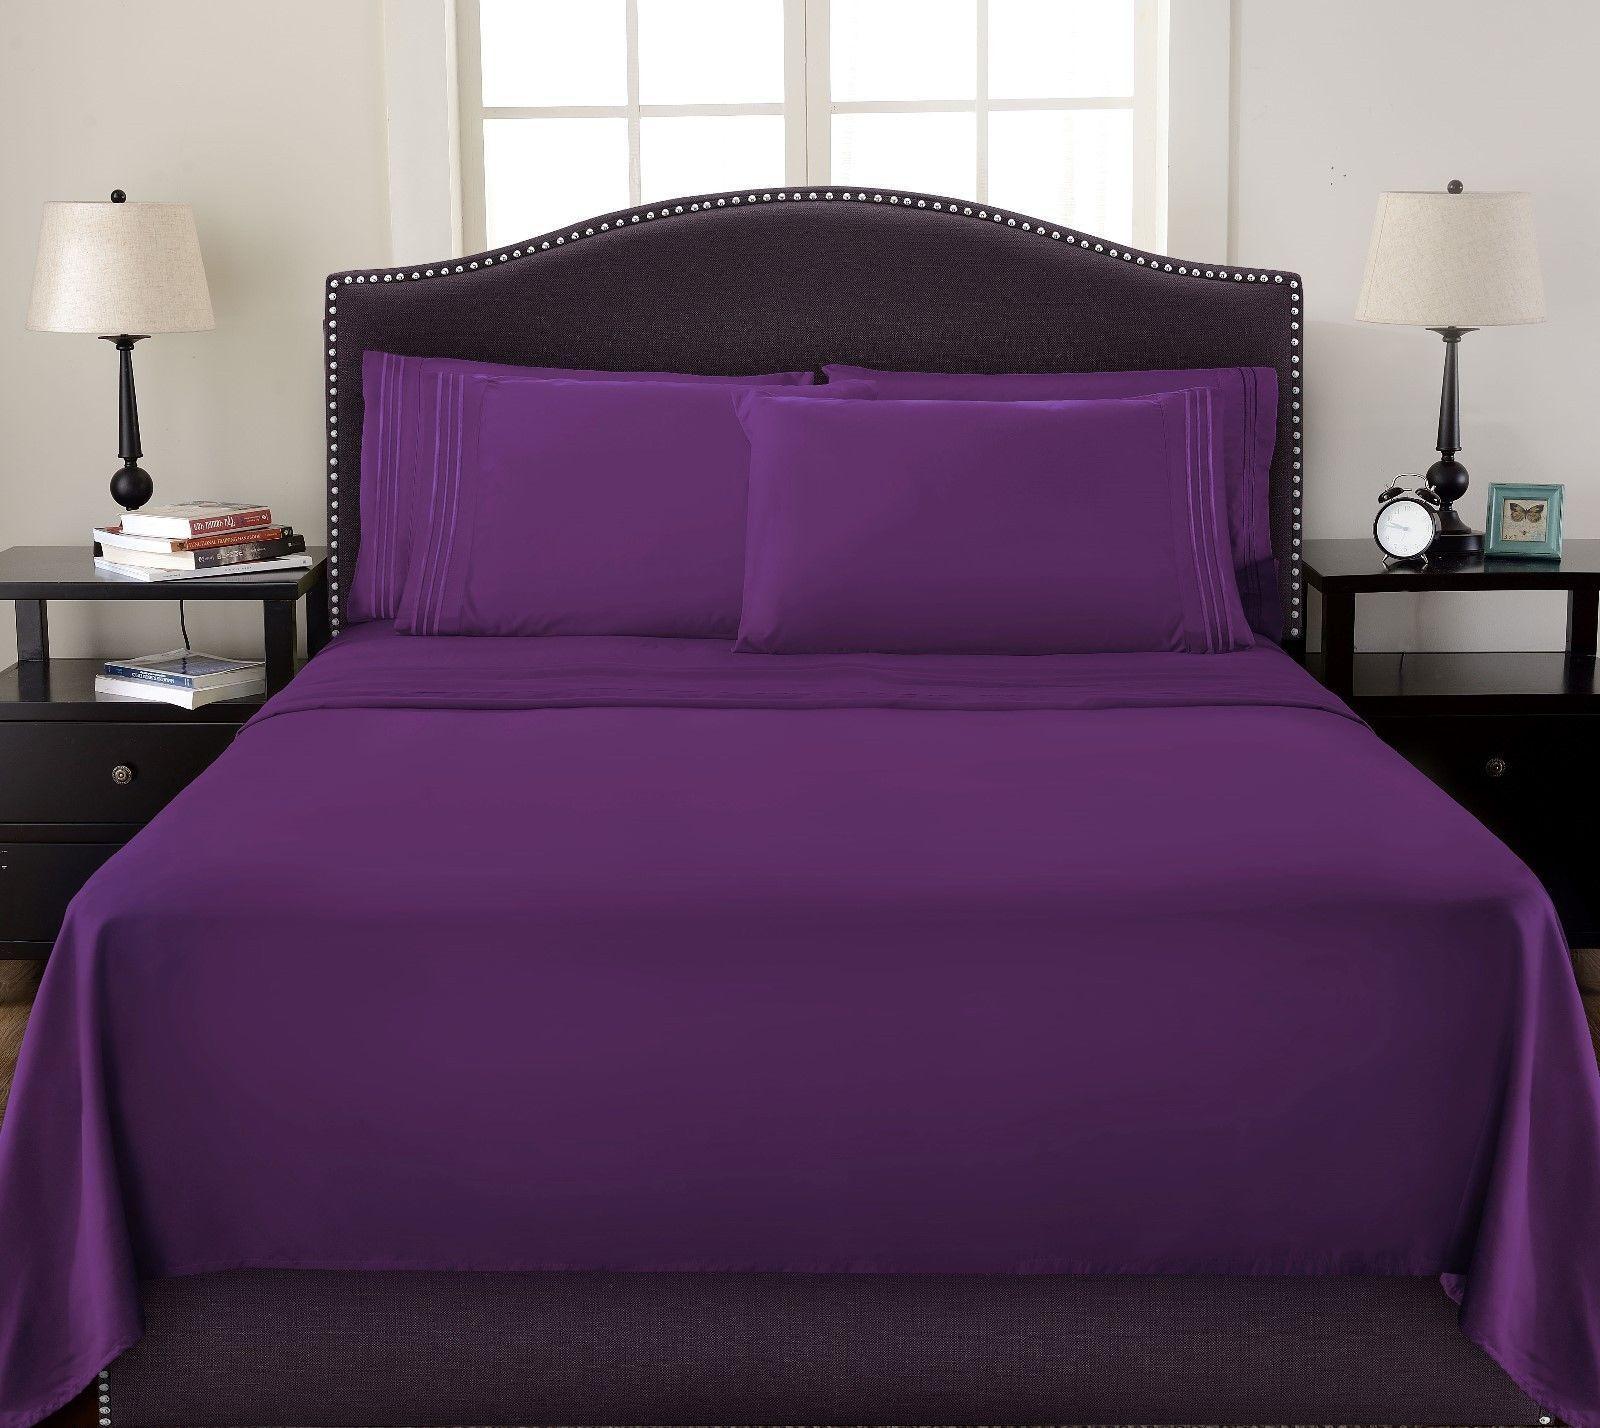 Egyptian Comfort 1800 Count Color Sheets Deep Pocket 4 Piece Bed Sheet Set